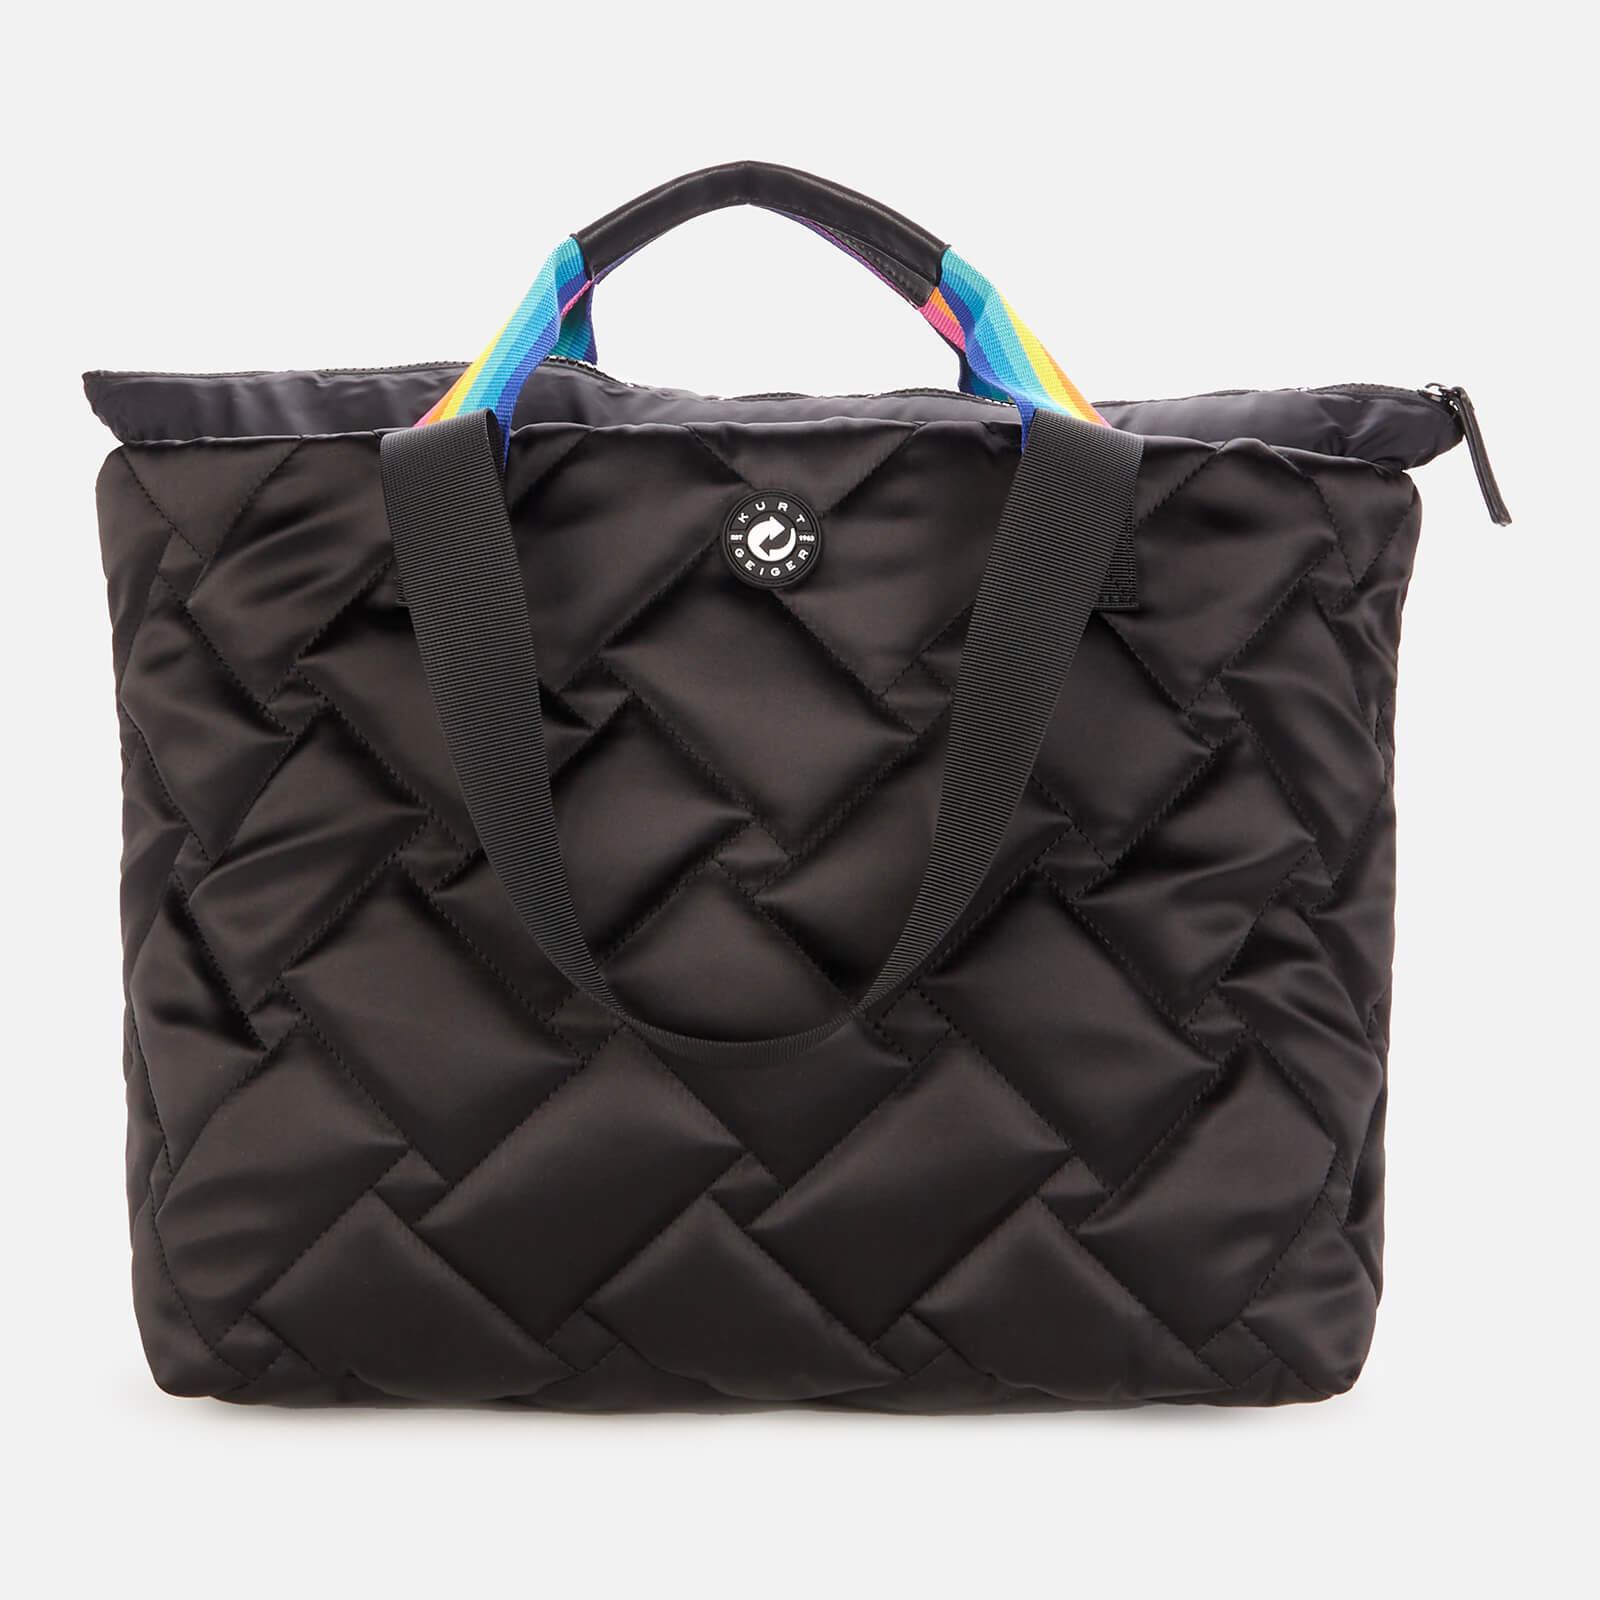 Kurt Geiger London Women's Recycled Tote Bag - Black